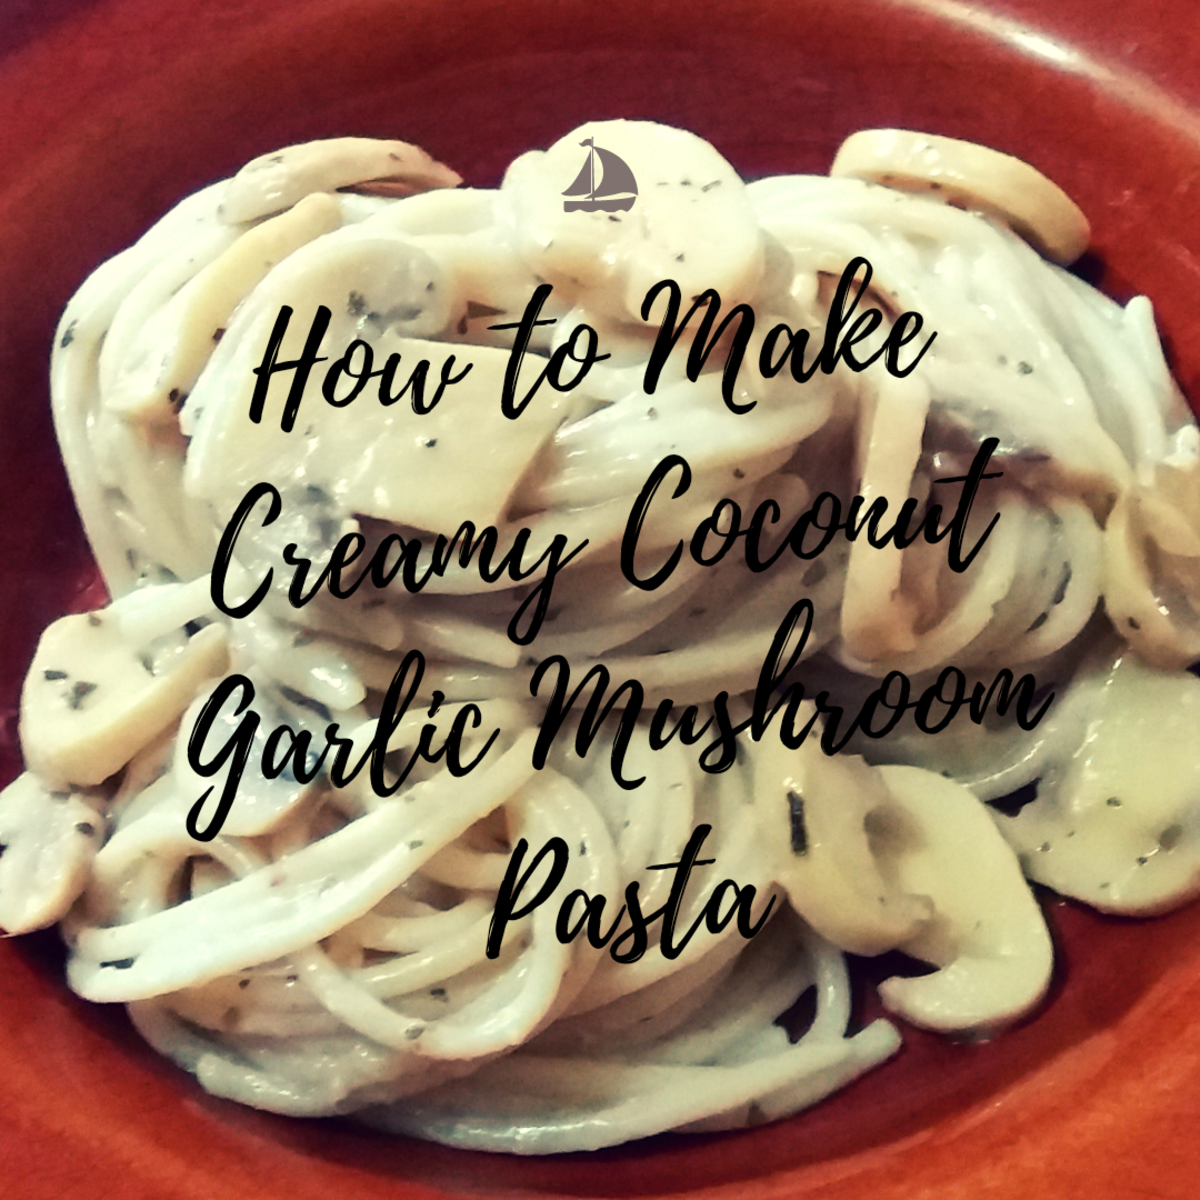 How to Make Creamy Coconut Garlic Mushroom Pasta